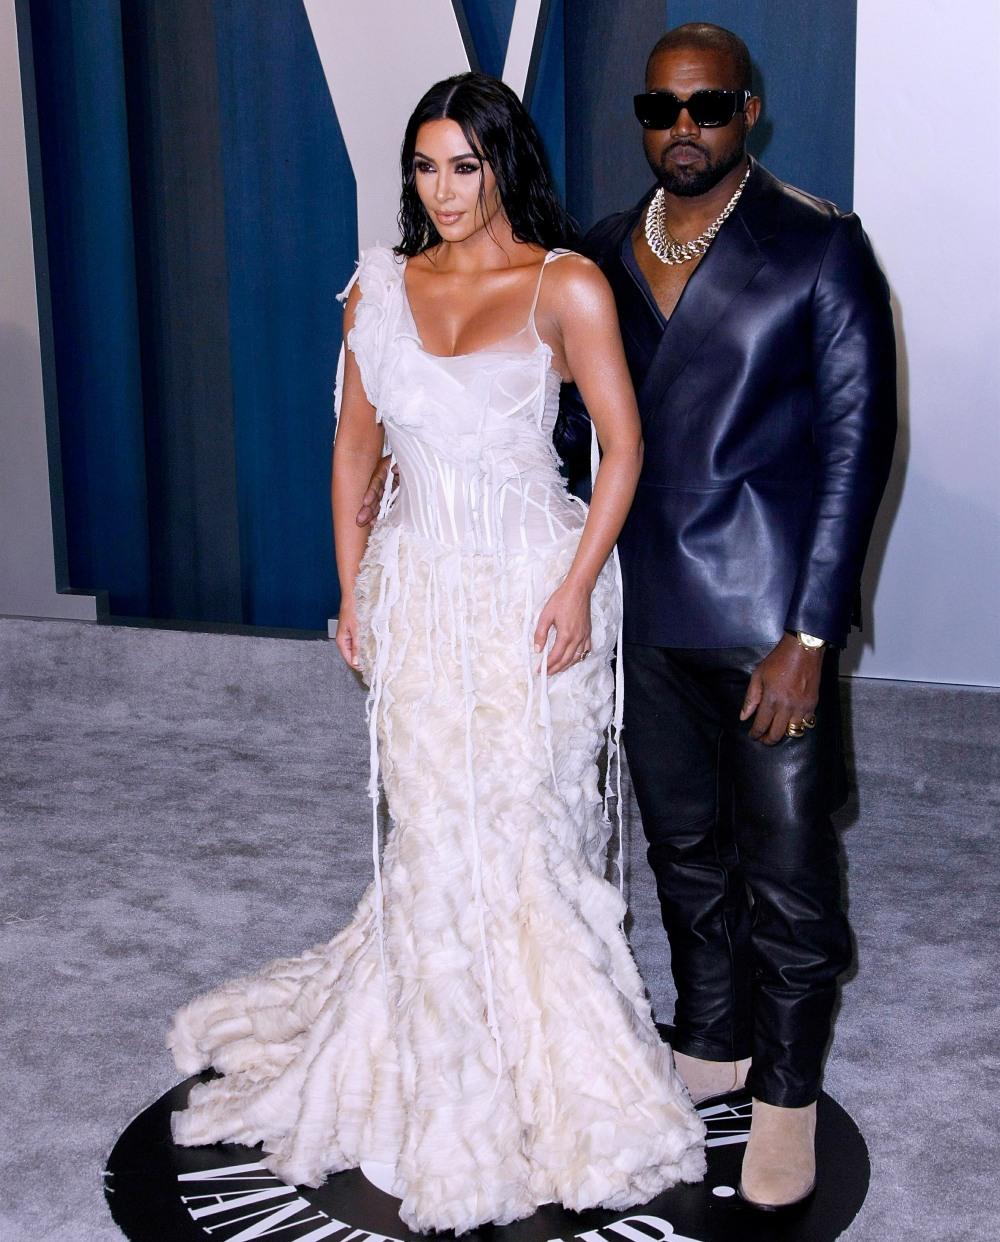 2020 Vanity Fair Oscar Party - Arrivals